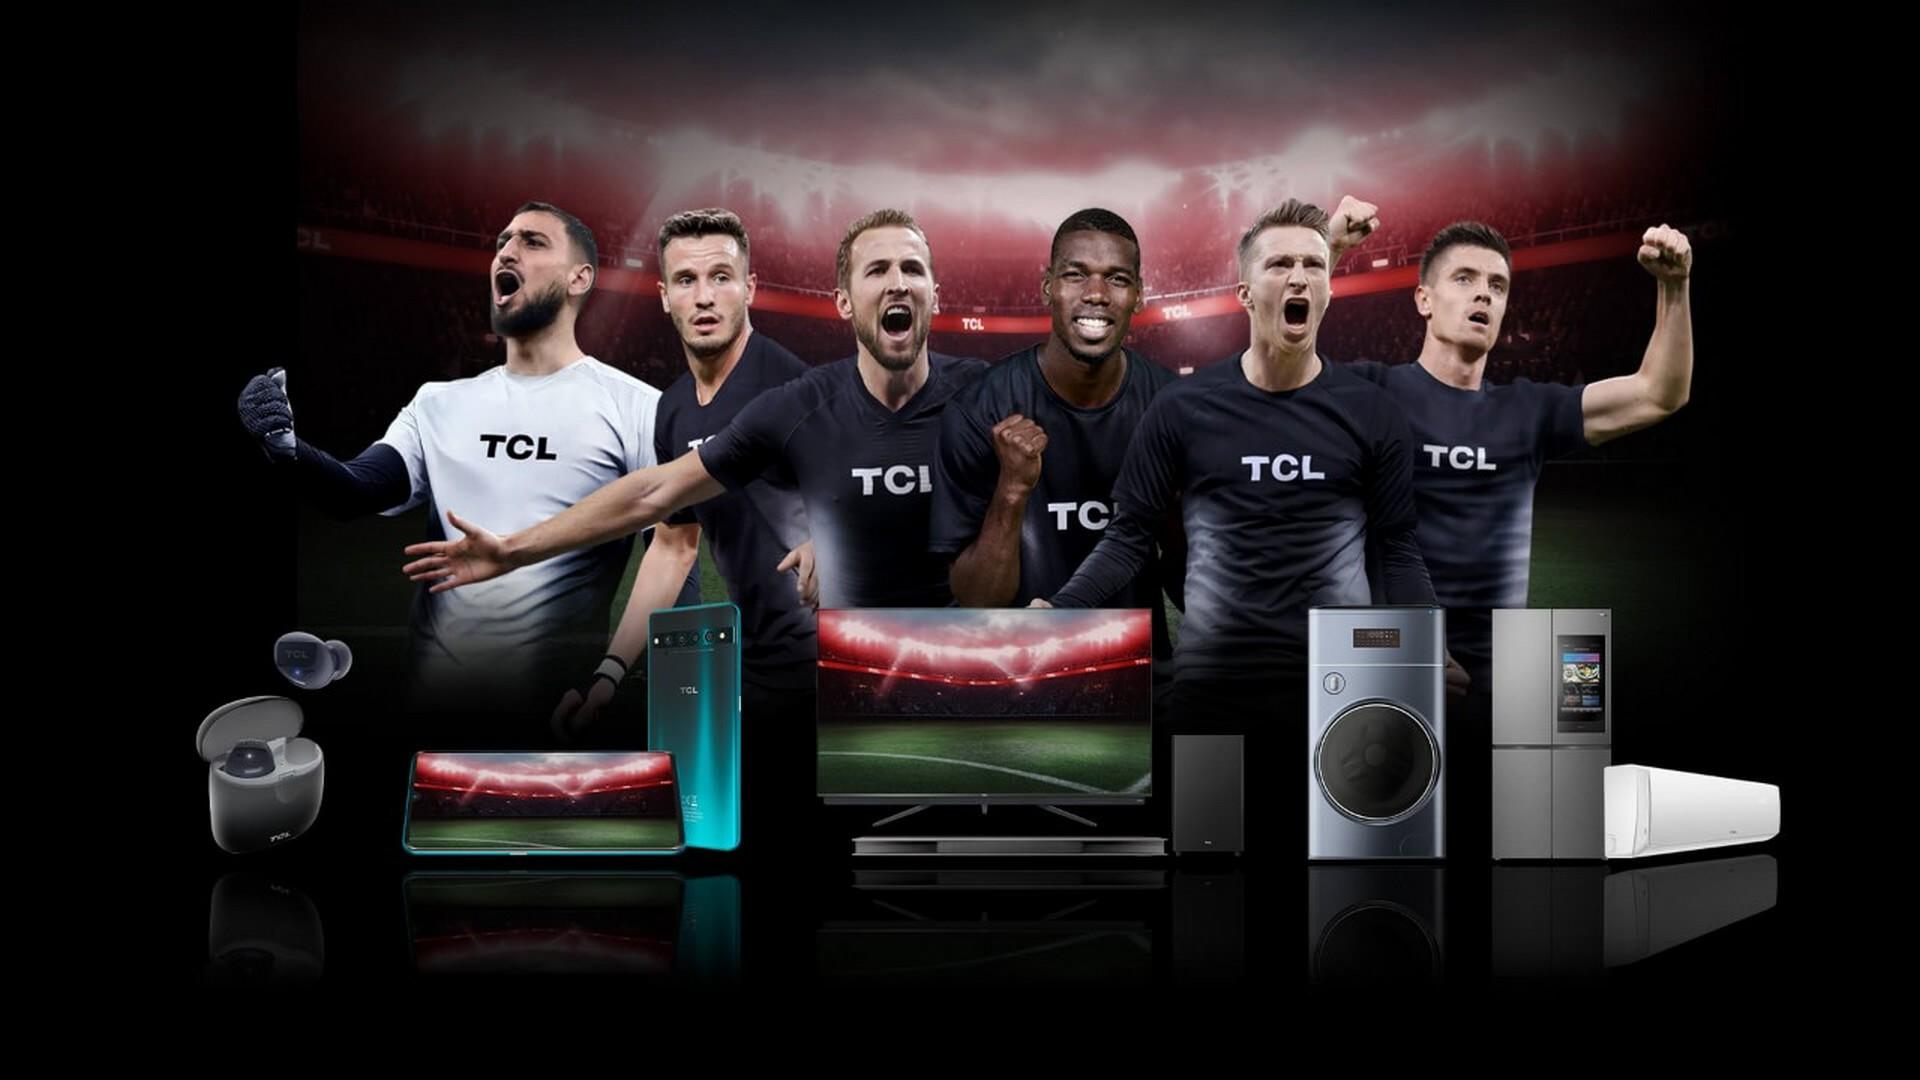 TCL x Ambassadeurs (football) Euro 2021